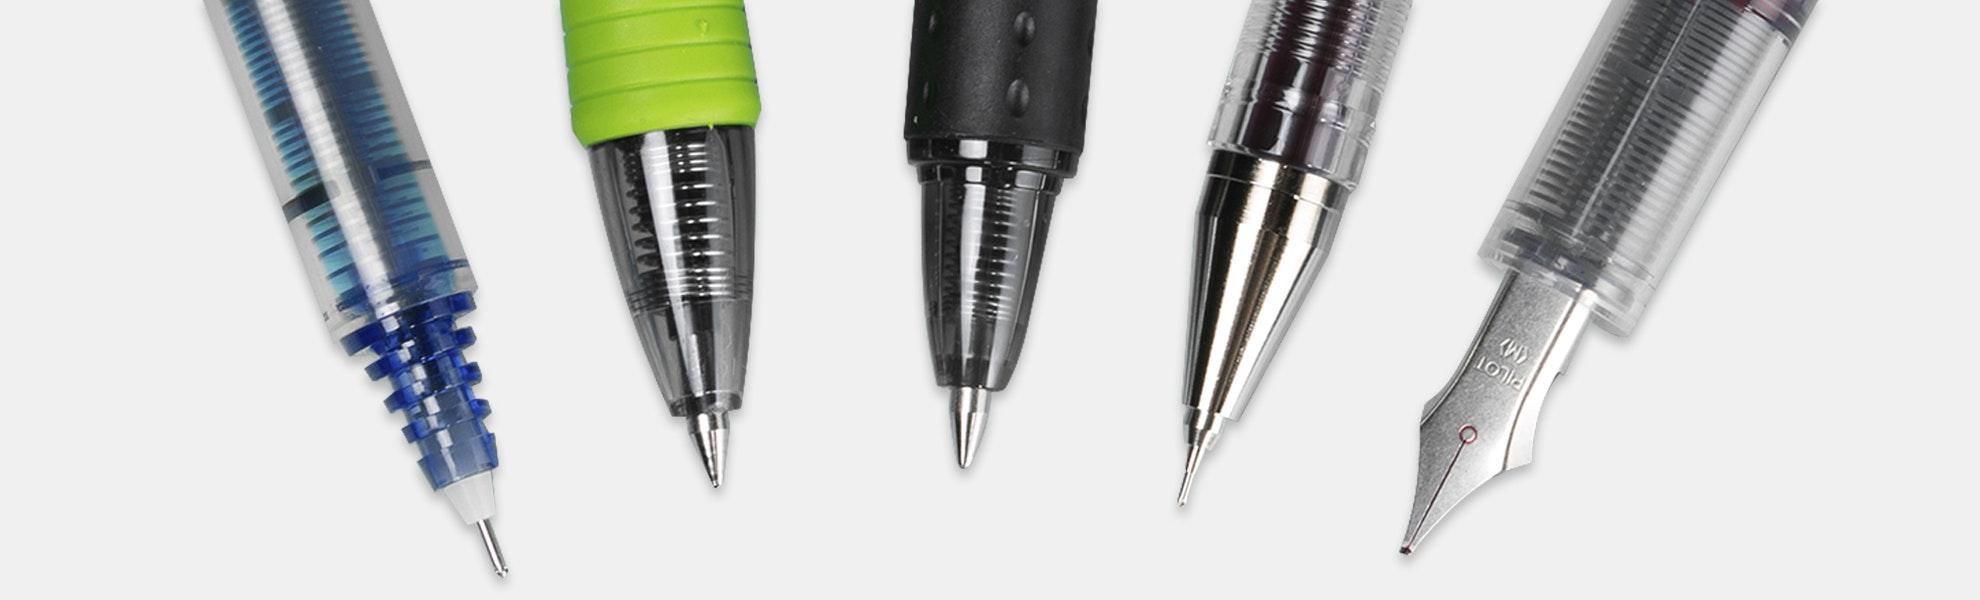 Pilot Pen Super Pack